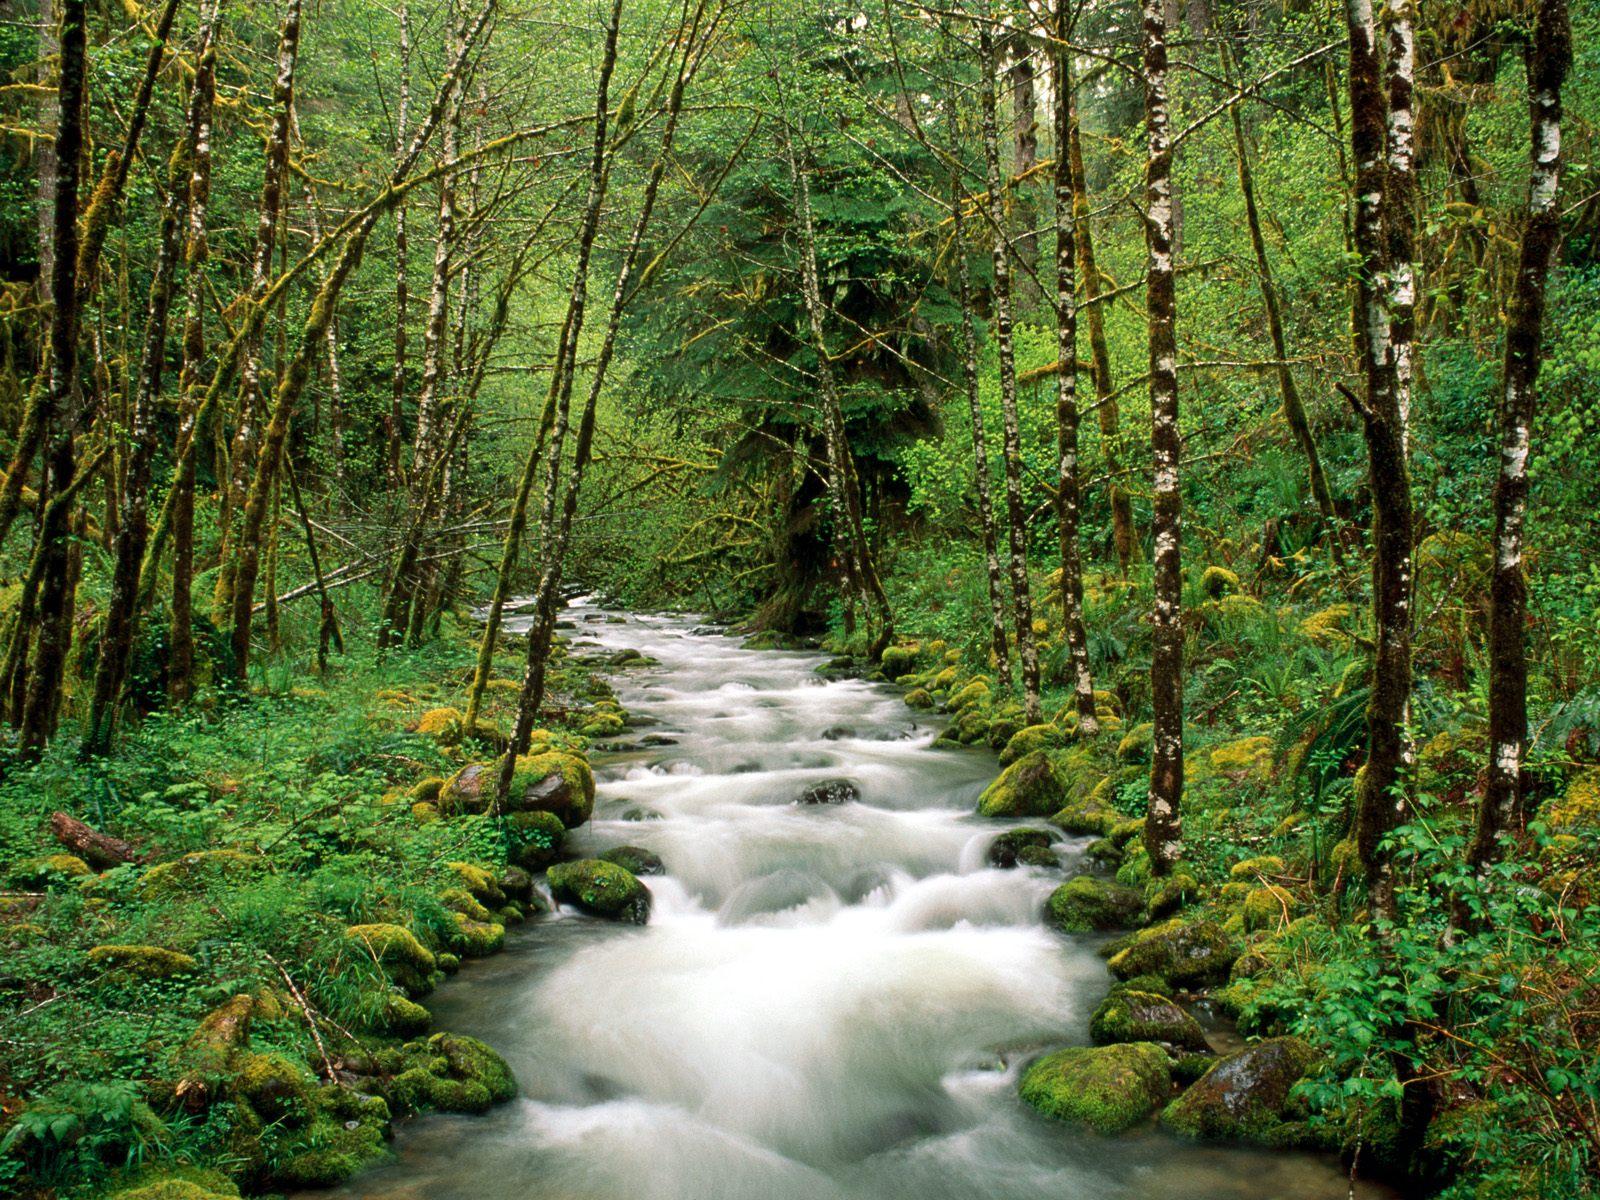 Mckenzie river willamette national forest oregon